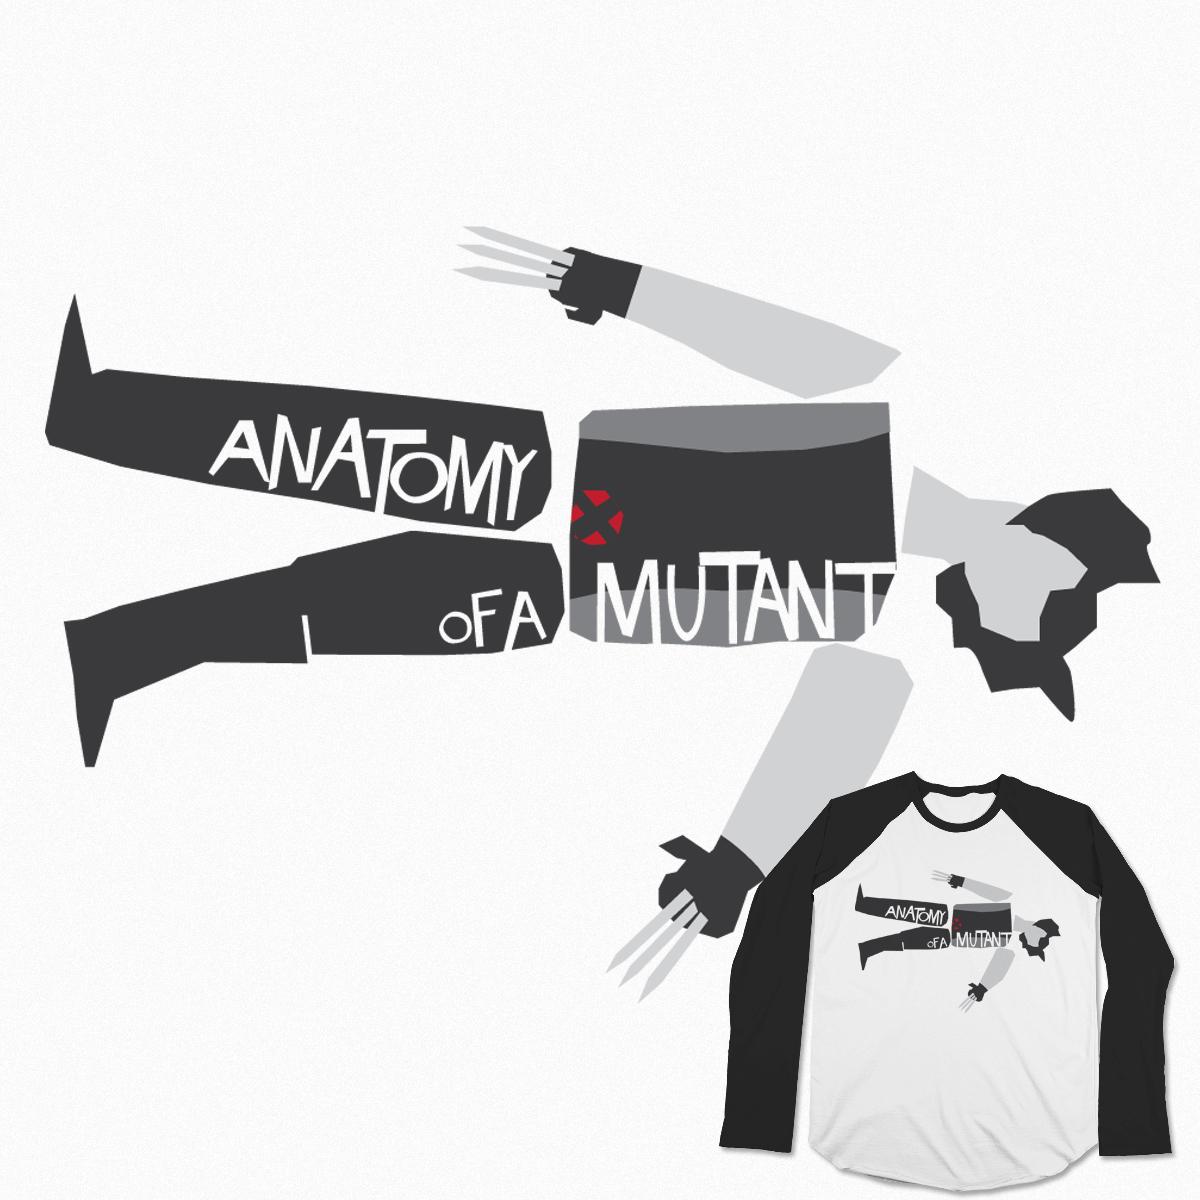 Anatomy Of A Mutant by ZombieMedia on Threadless